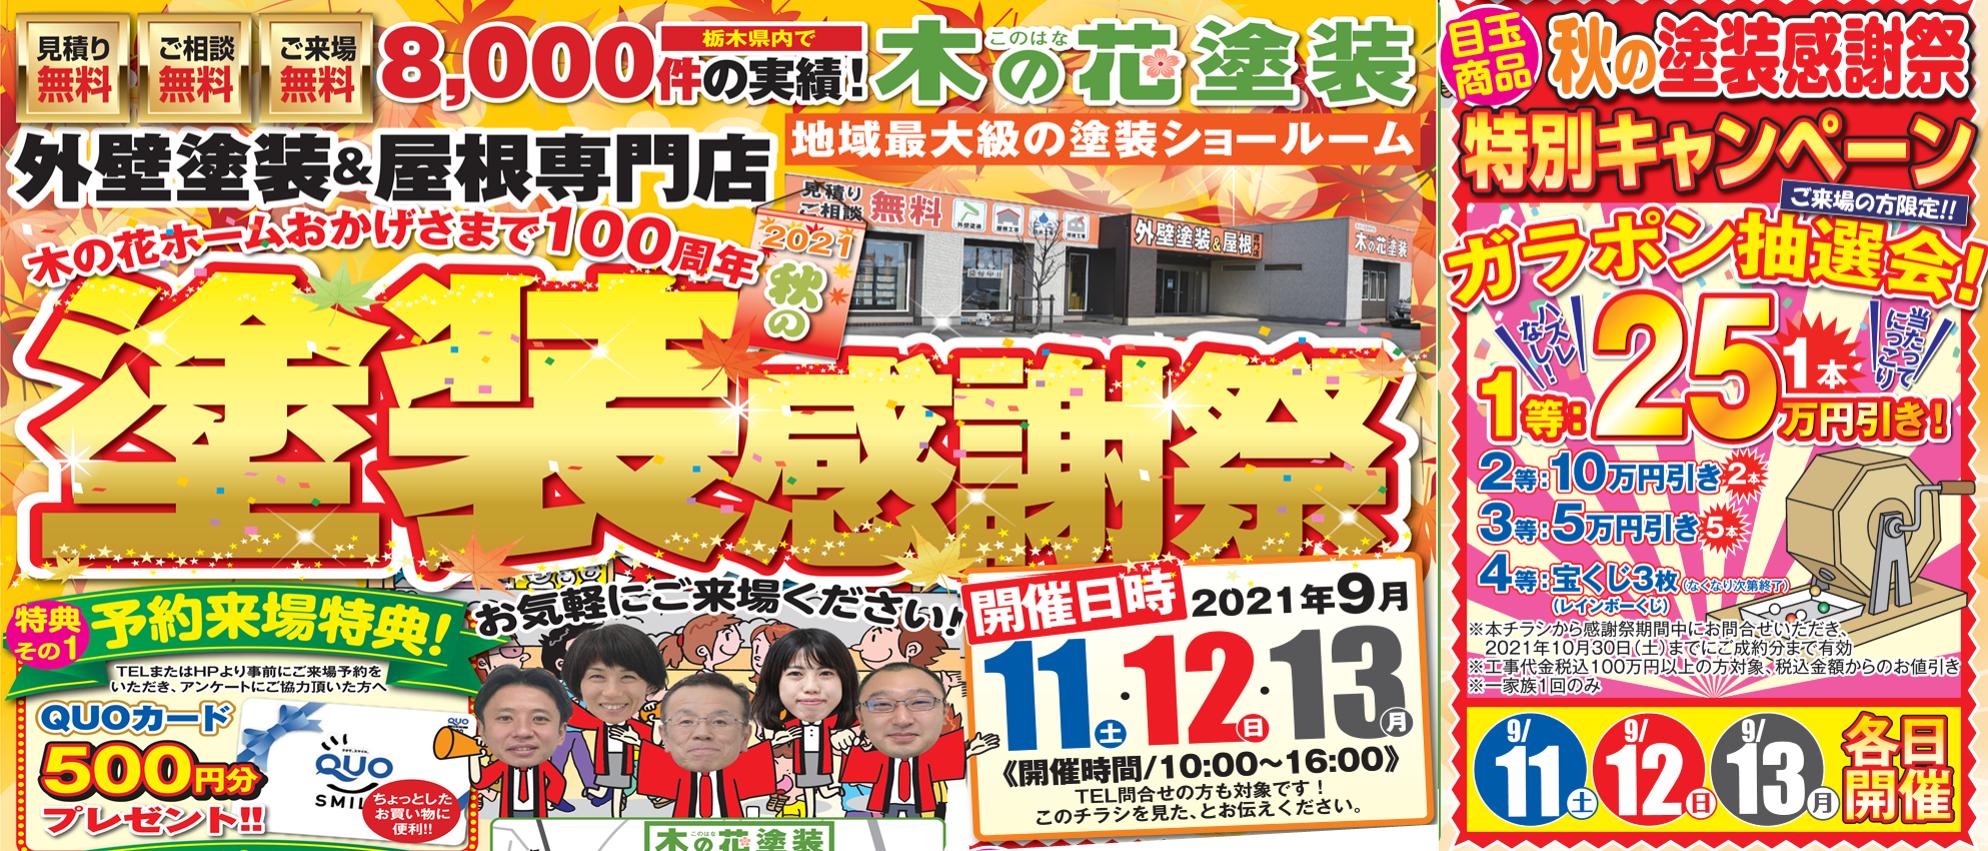 栃木県栃木市の外壁塗装、屋根塗装、屋根リフォーム、雨漏り補修、防水工事